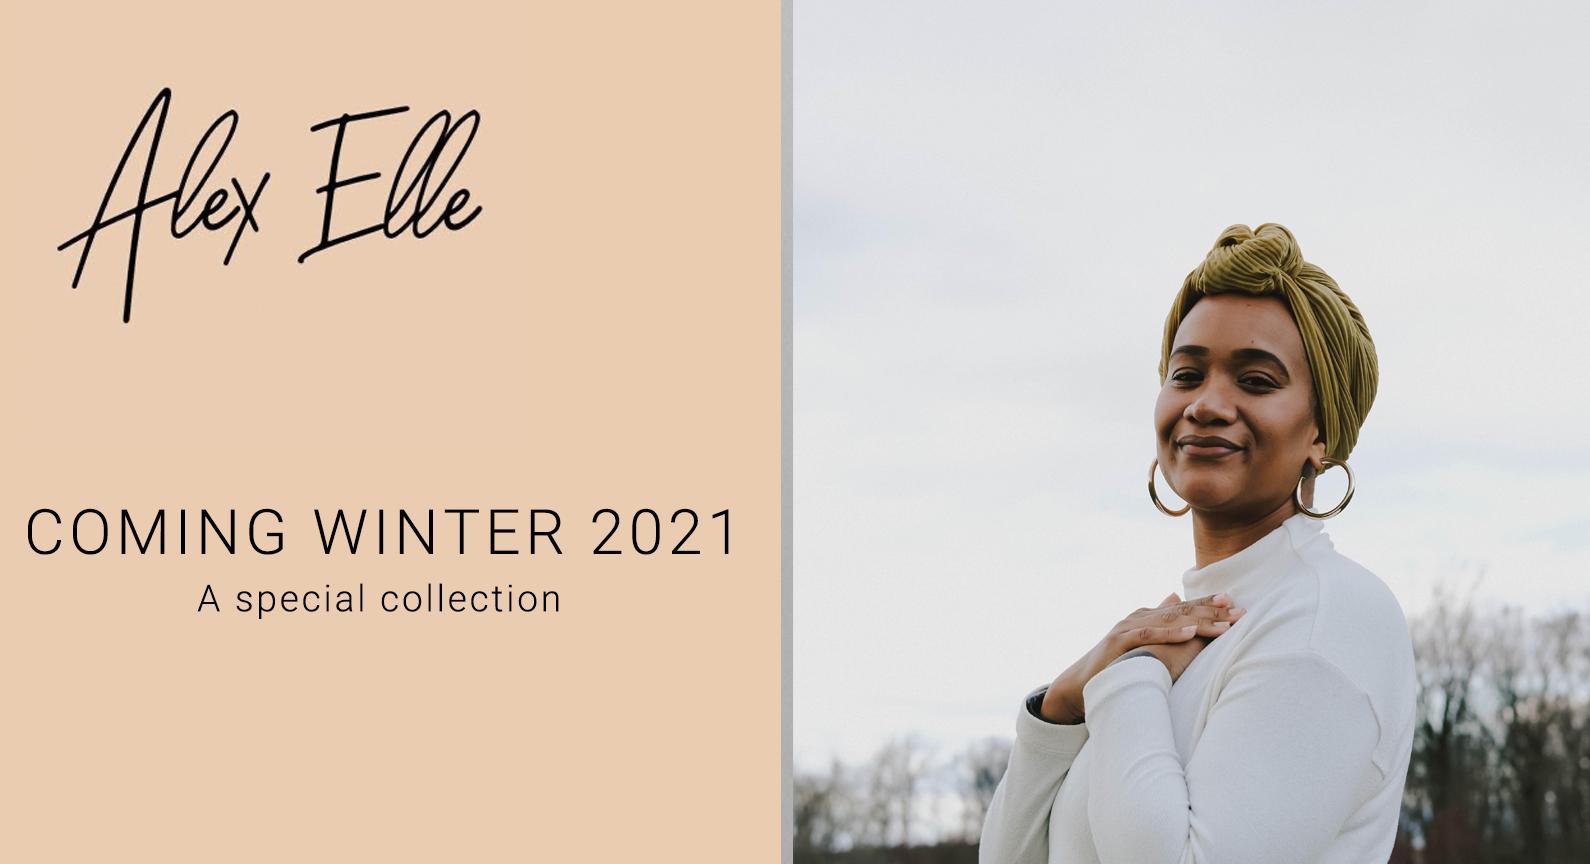 Alex Elle Jewelry Collaboration